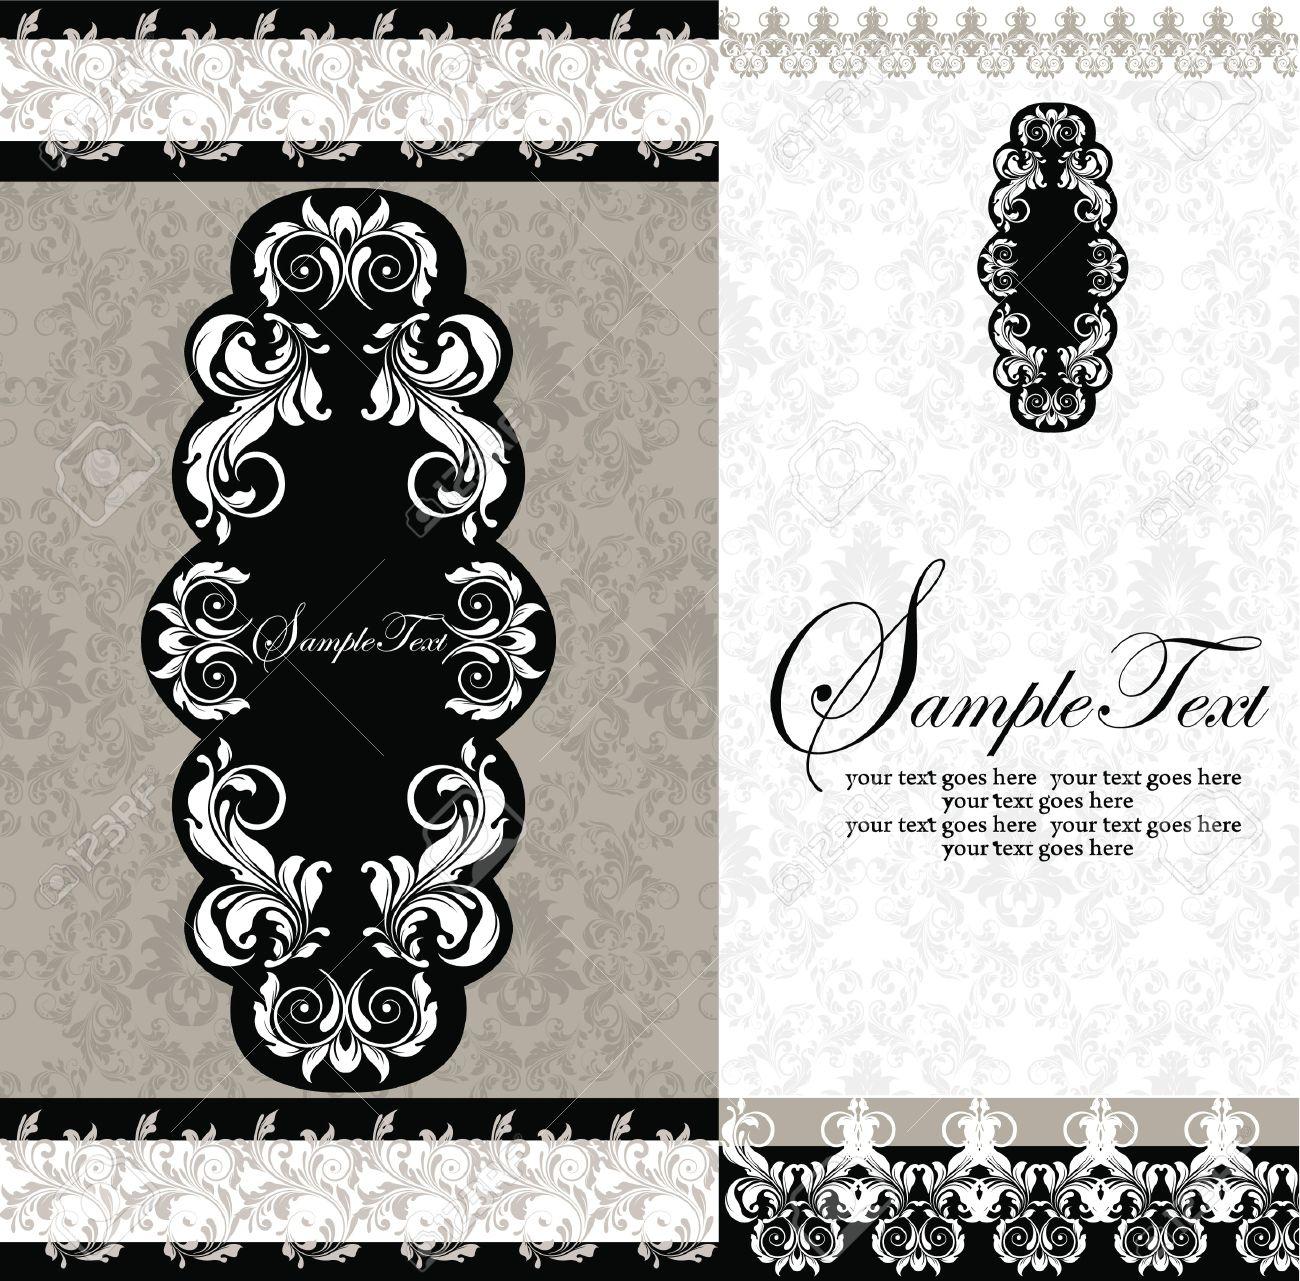 Black And White Damask Wedding Invitations Royalty Free Cliparts – Black and White Damask Wedding Invitations